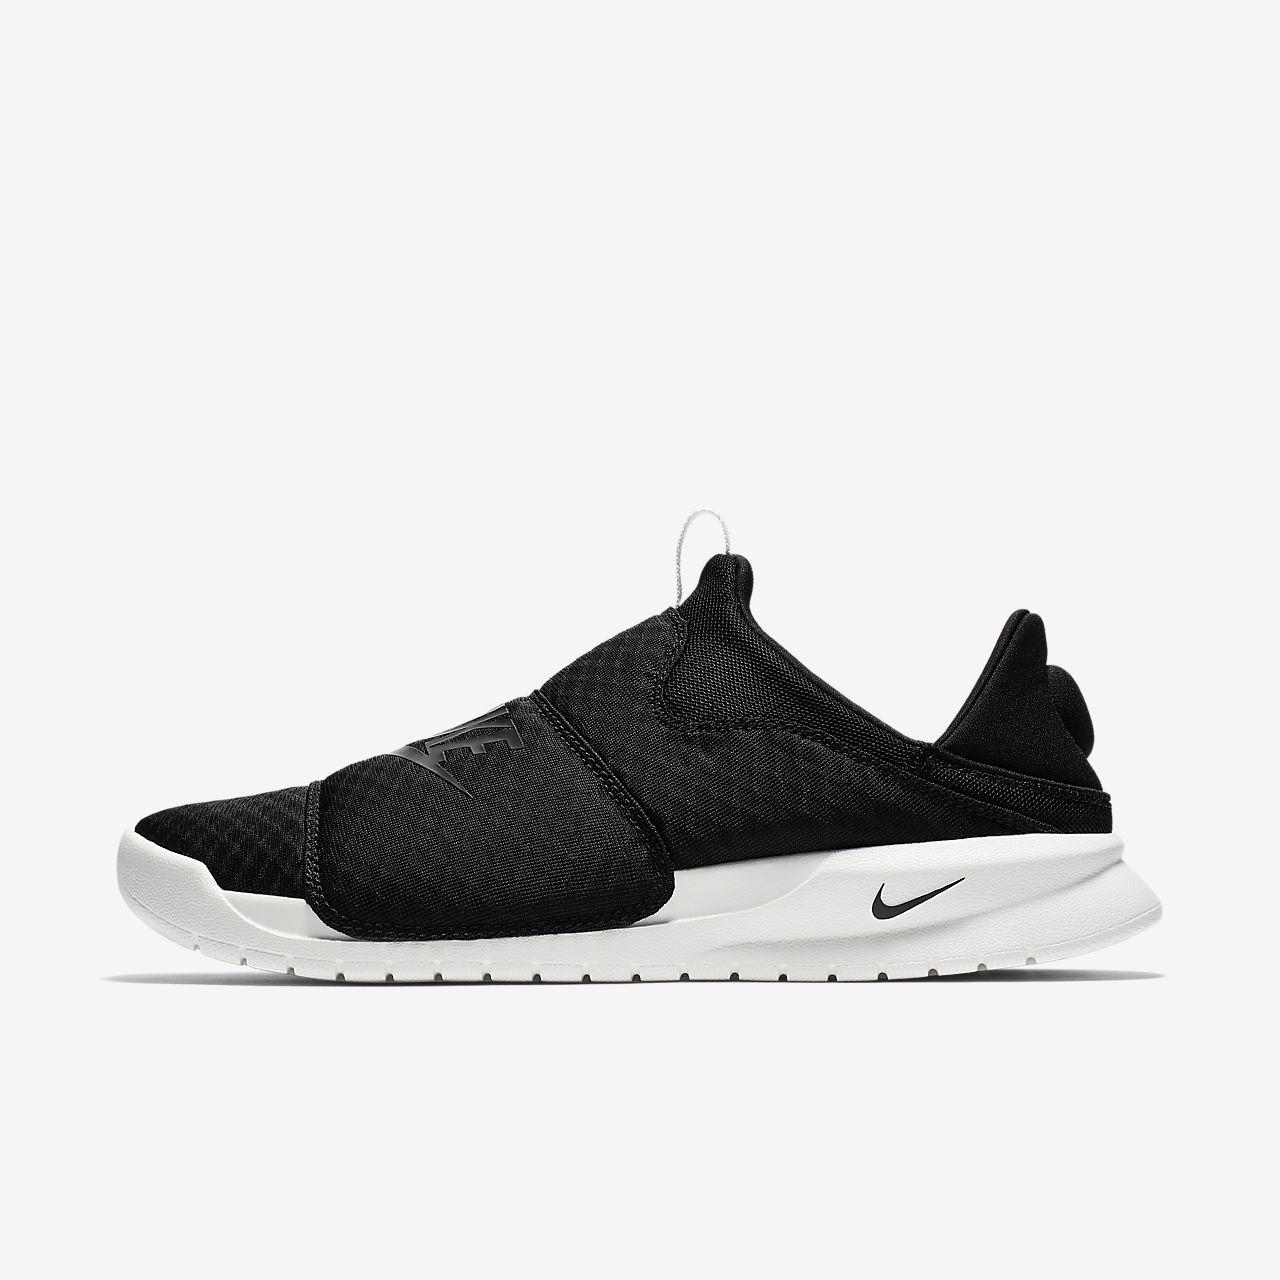 Low Resolution Nike Benassi Slip Shoe Nike Benassi Slip Shoe 1abb29ee4